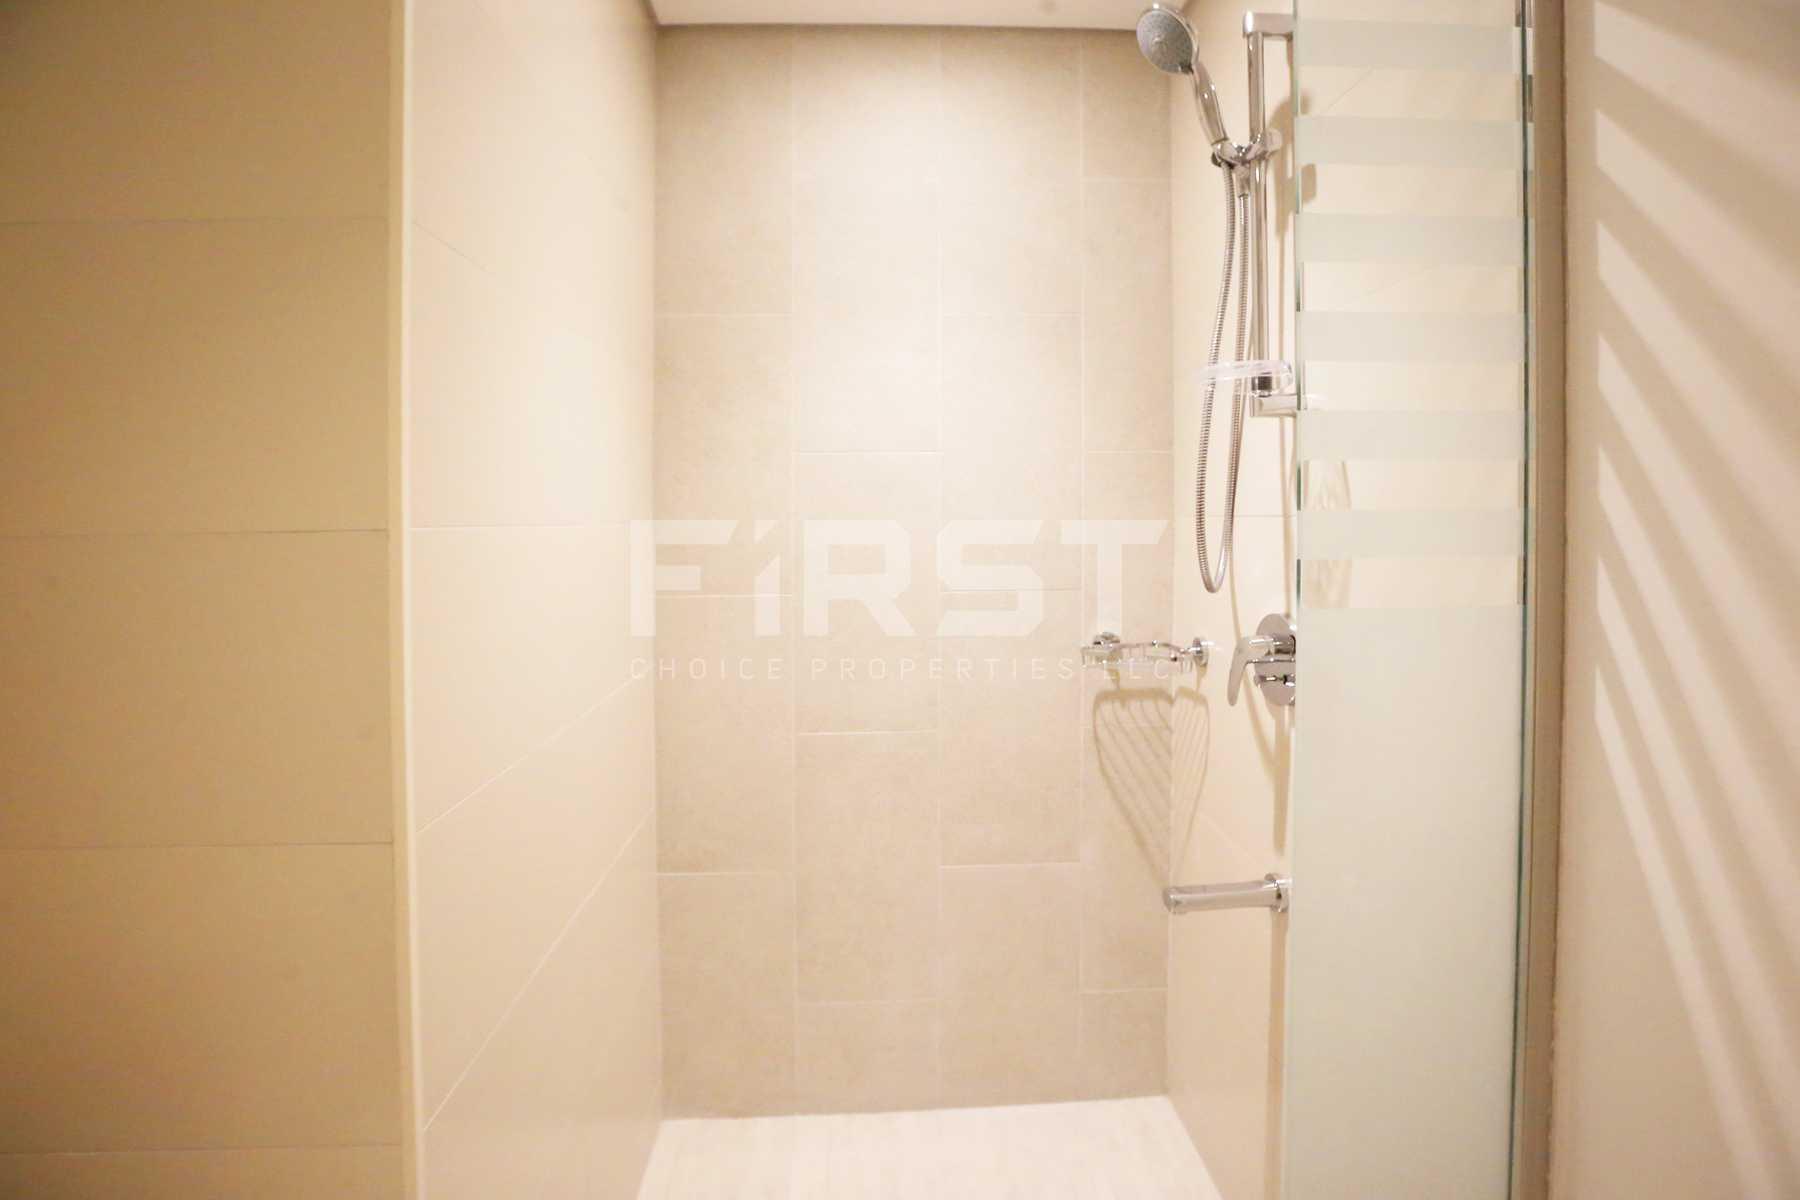 Internal Photo of 1 Bedroom Apartment in The Bridges Shams Abu Dhabi UAE (3).jpg